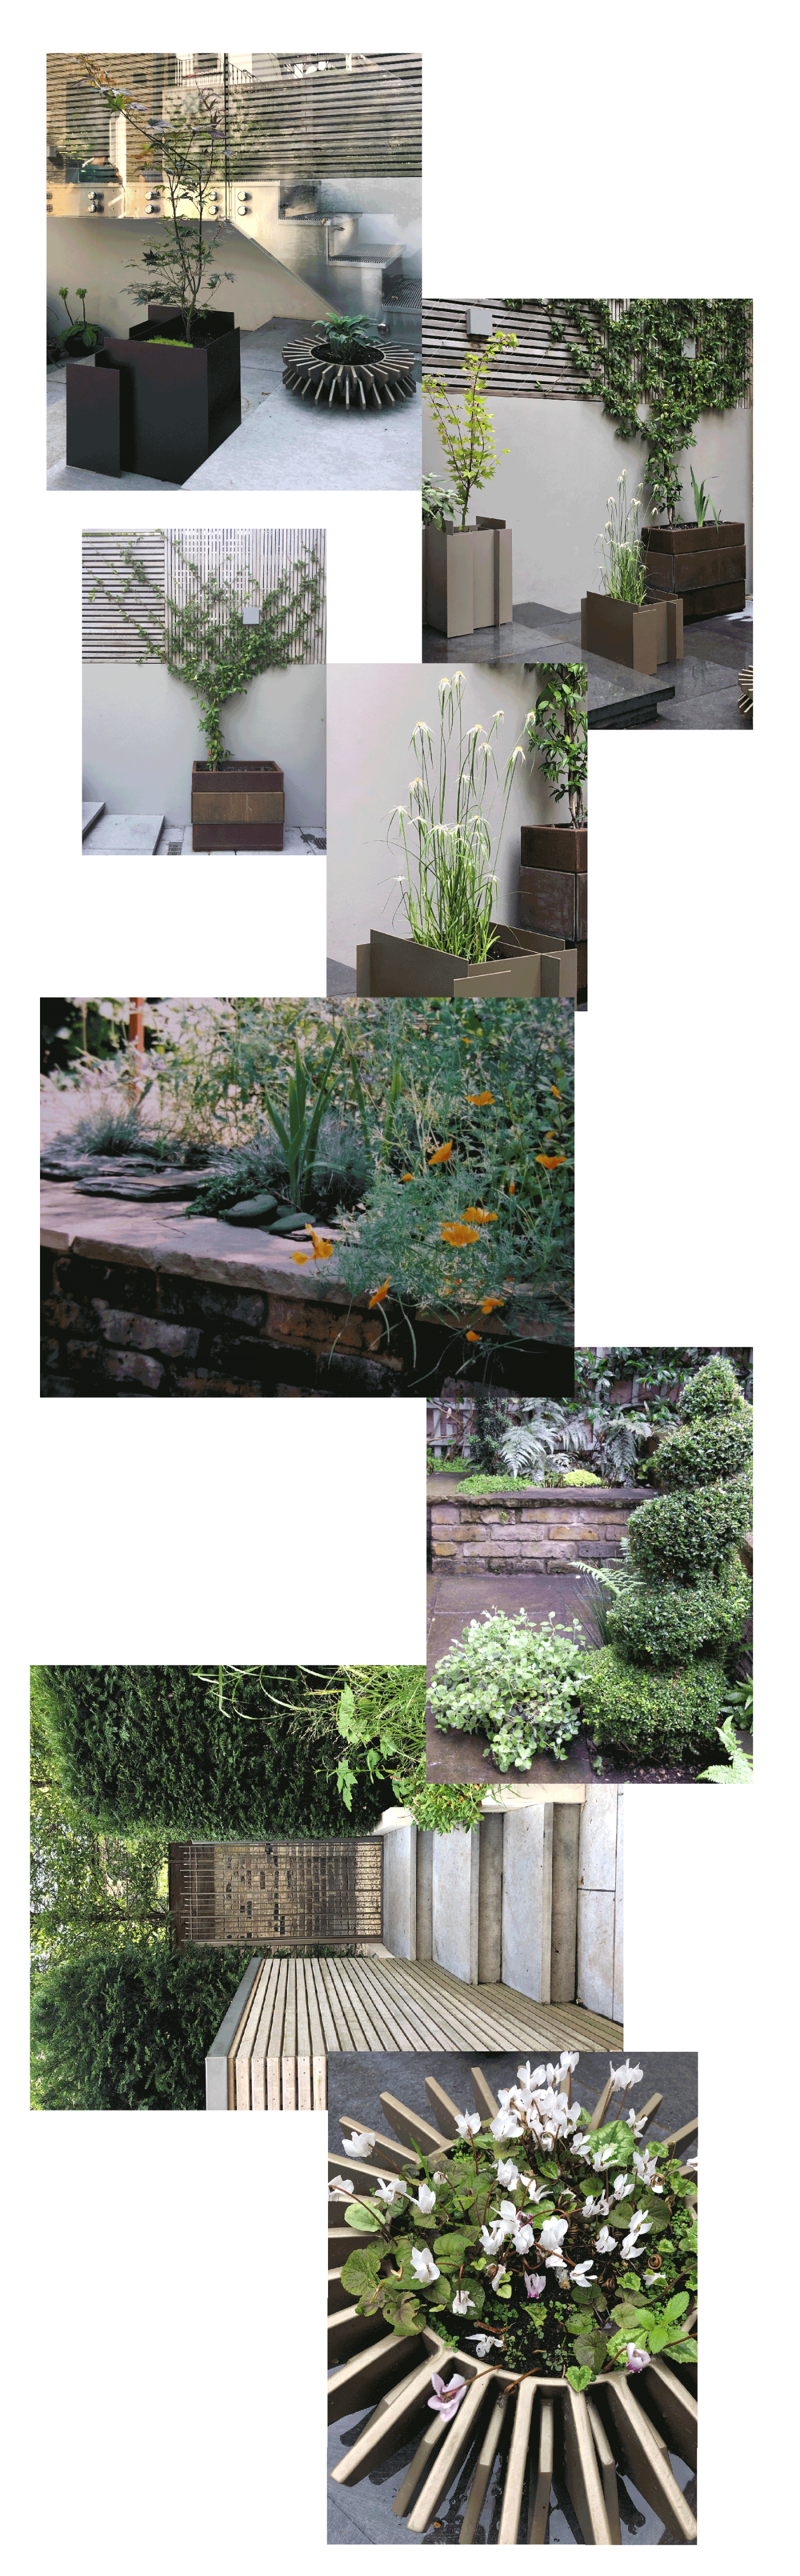 Gardening-London--Galerie-1